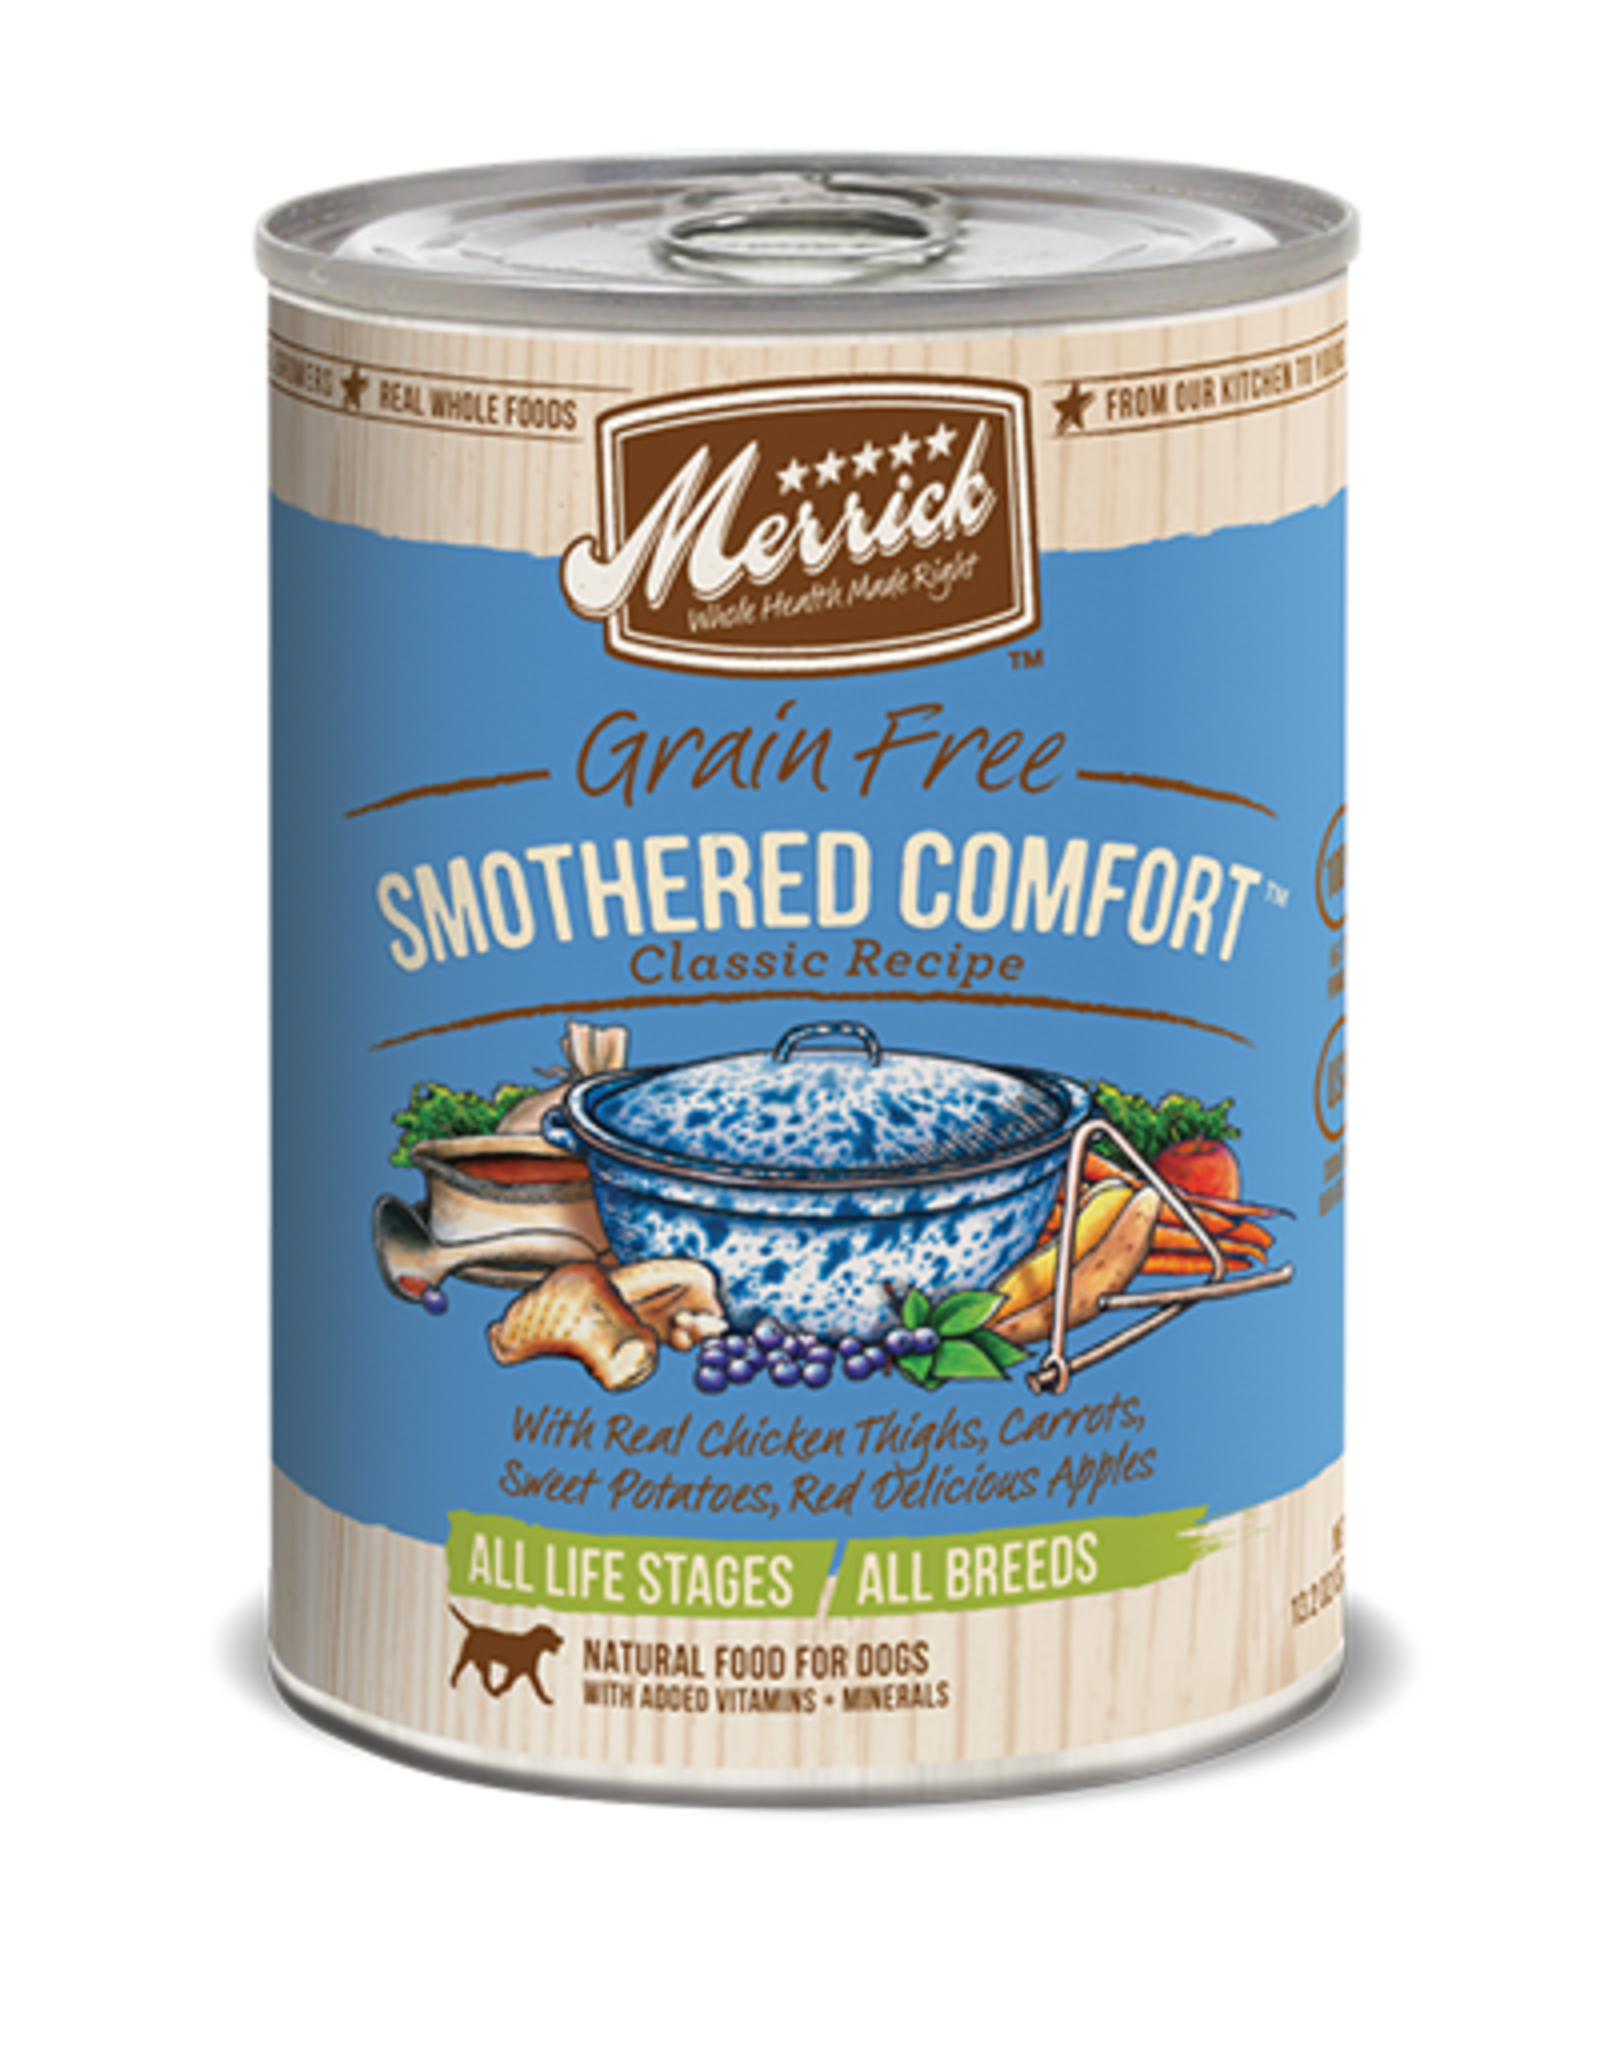 Merrick Pet Foods MERRICK CLASSIC SMOTHERED COMFORT, 12.7 oz.